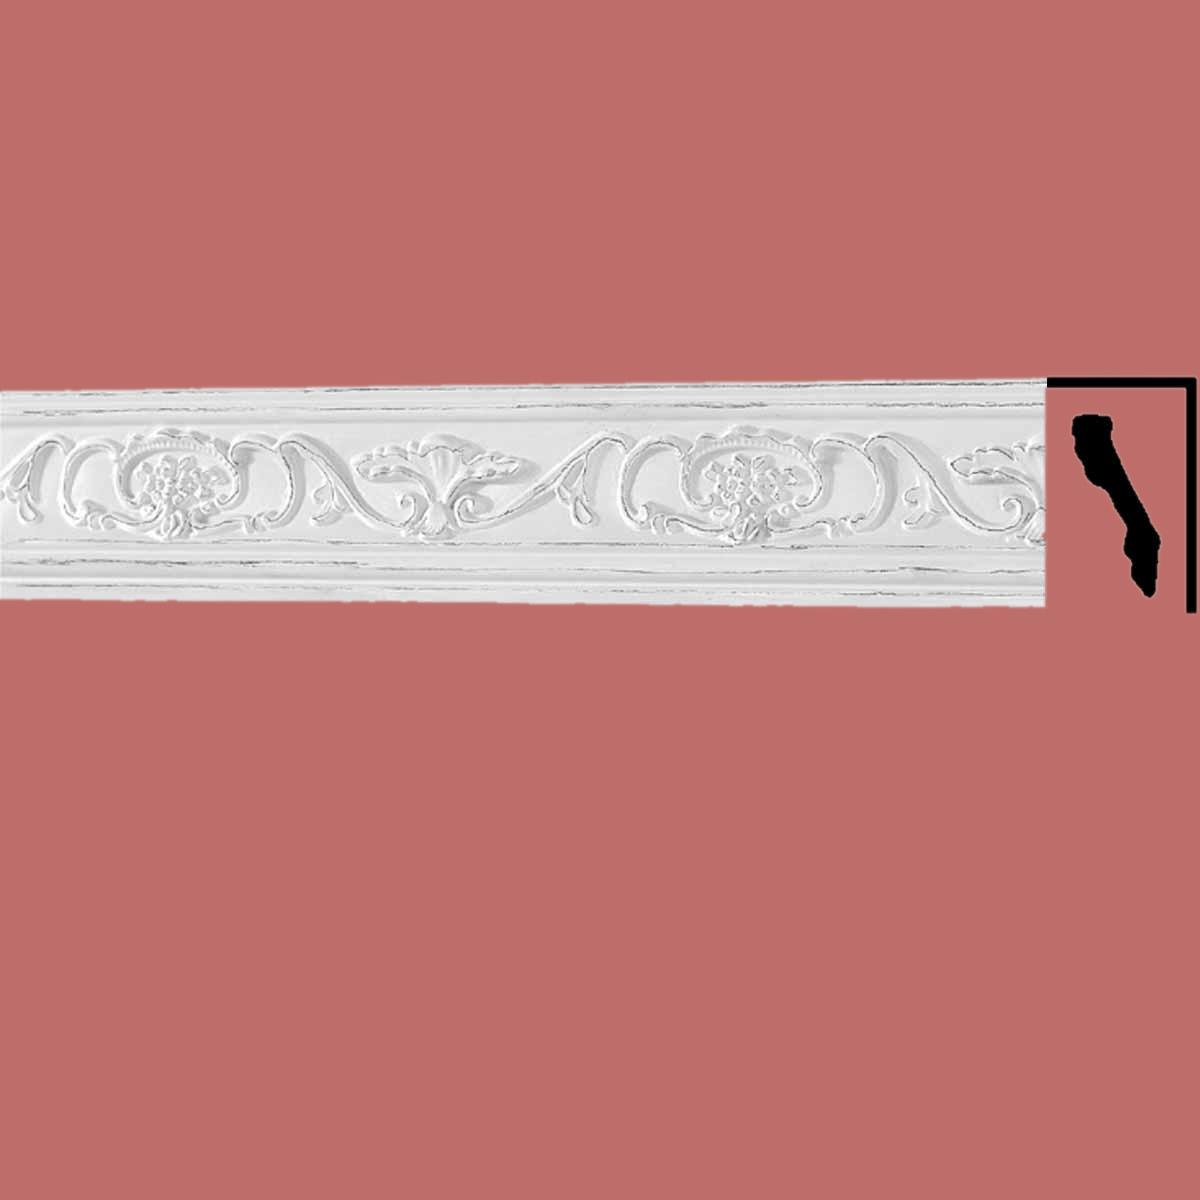 Cornice White Urethane Sample of 18867 Cornice Cornice Moulding Cornice Molding